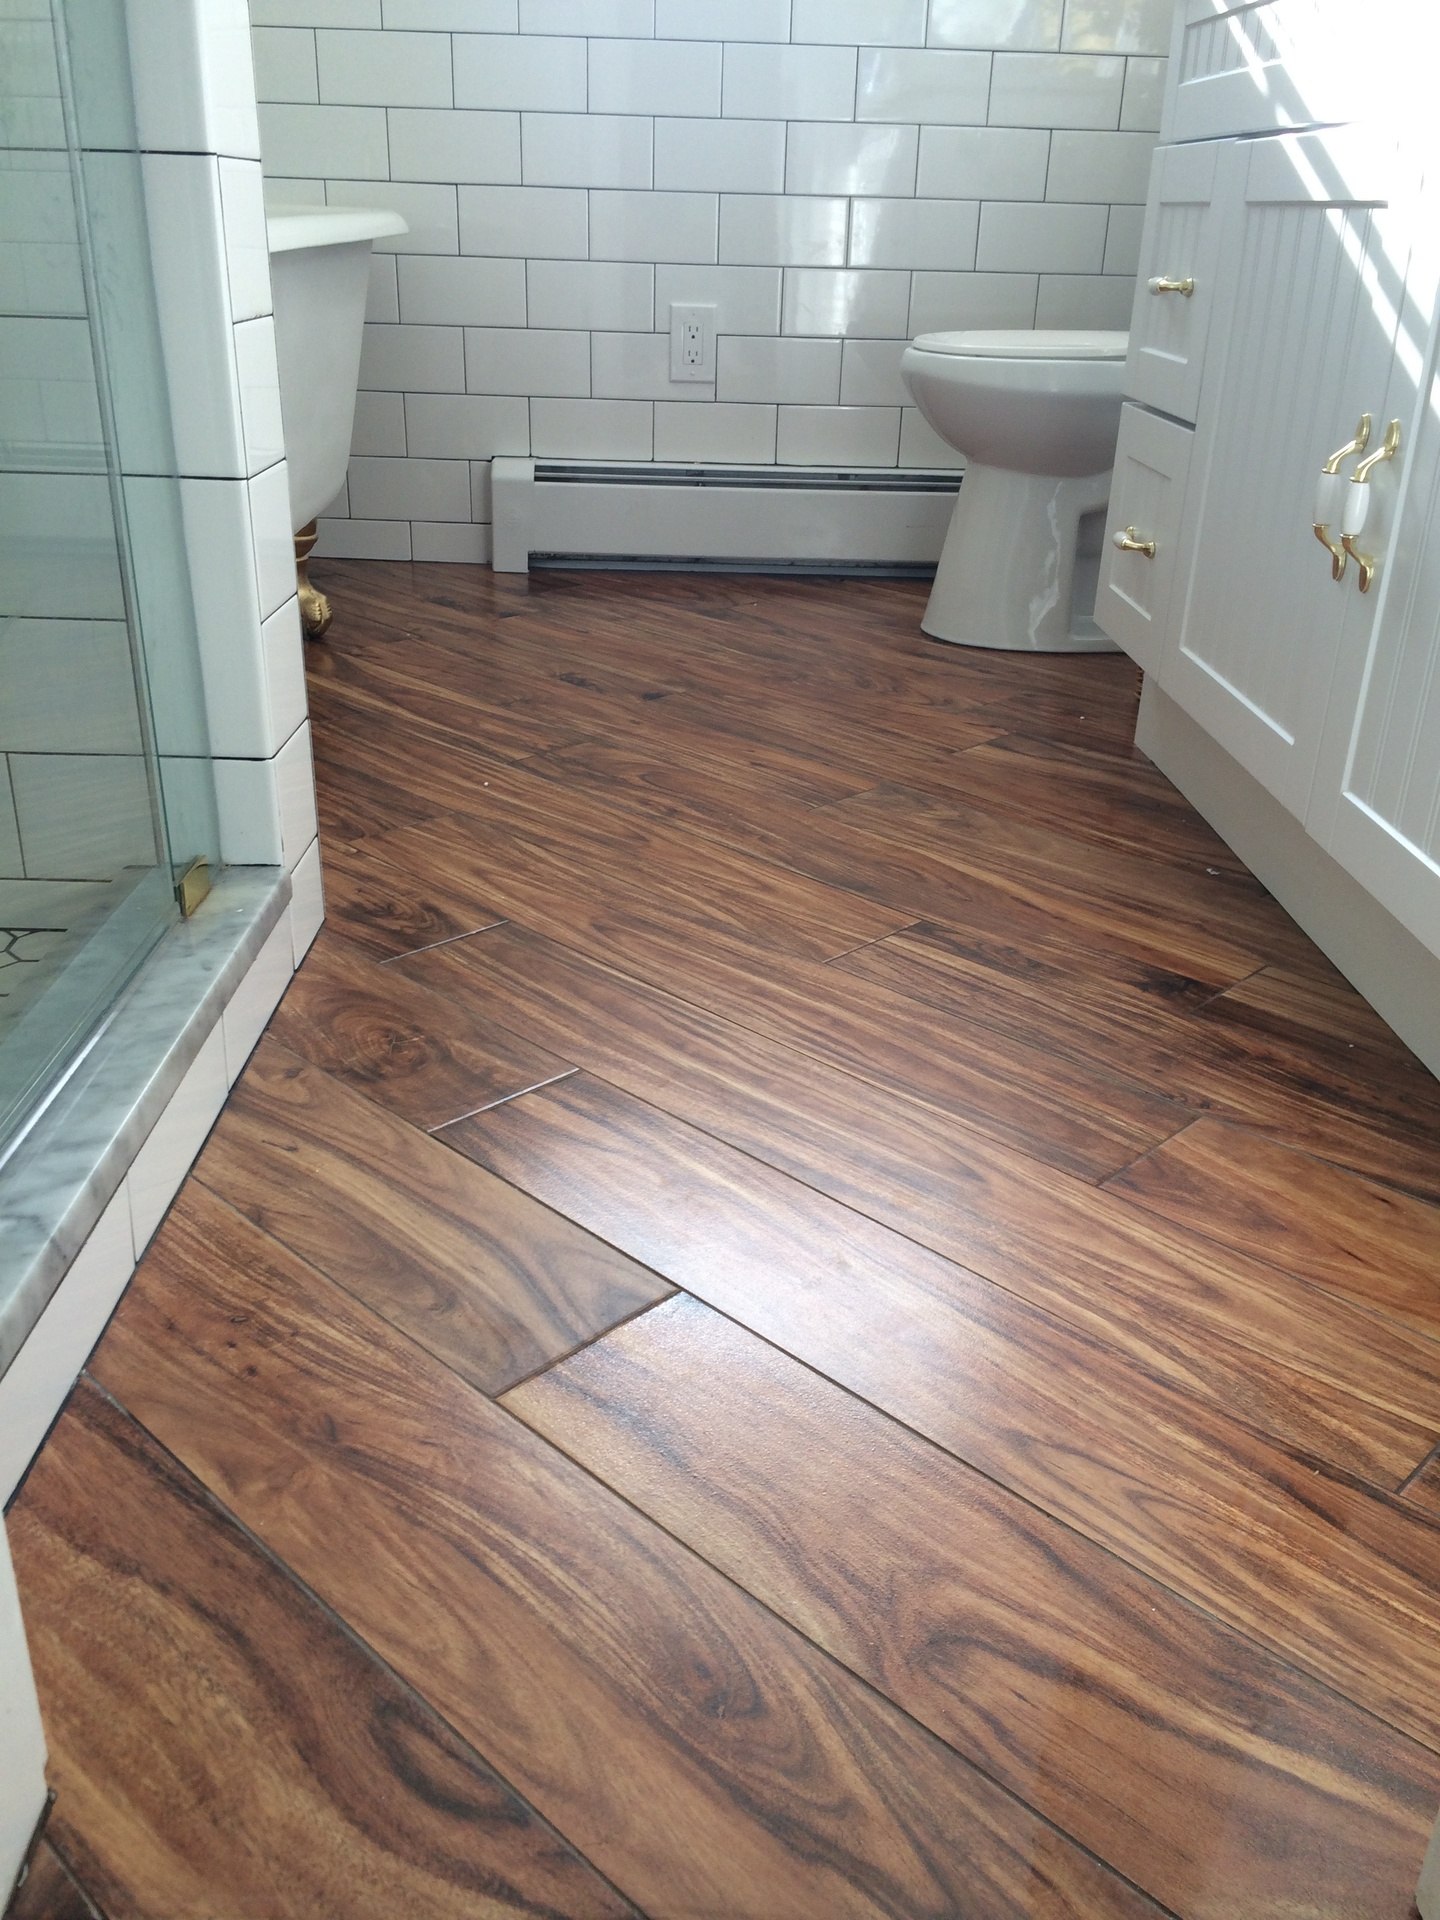 Ламинат по диагонали на полу ванной